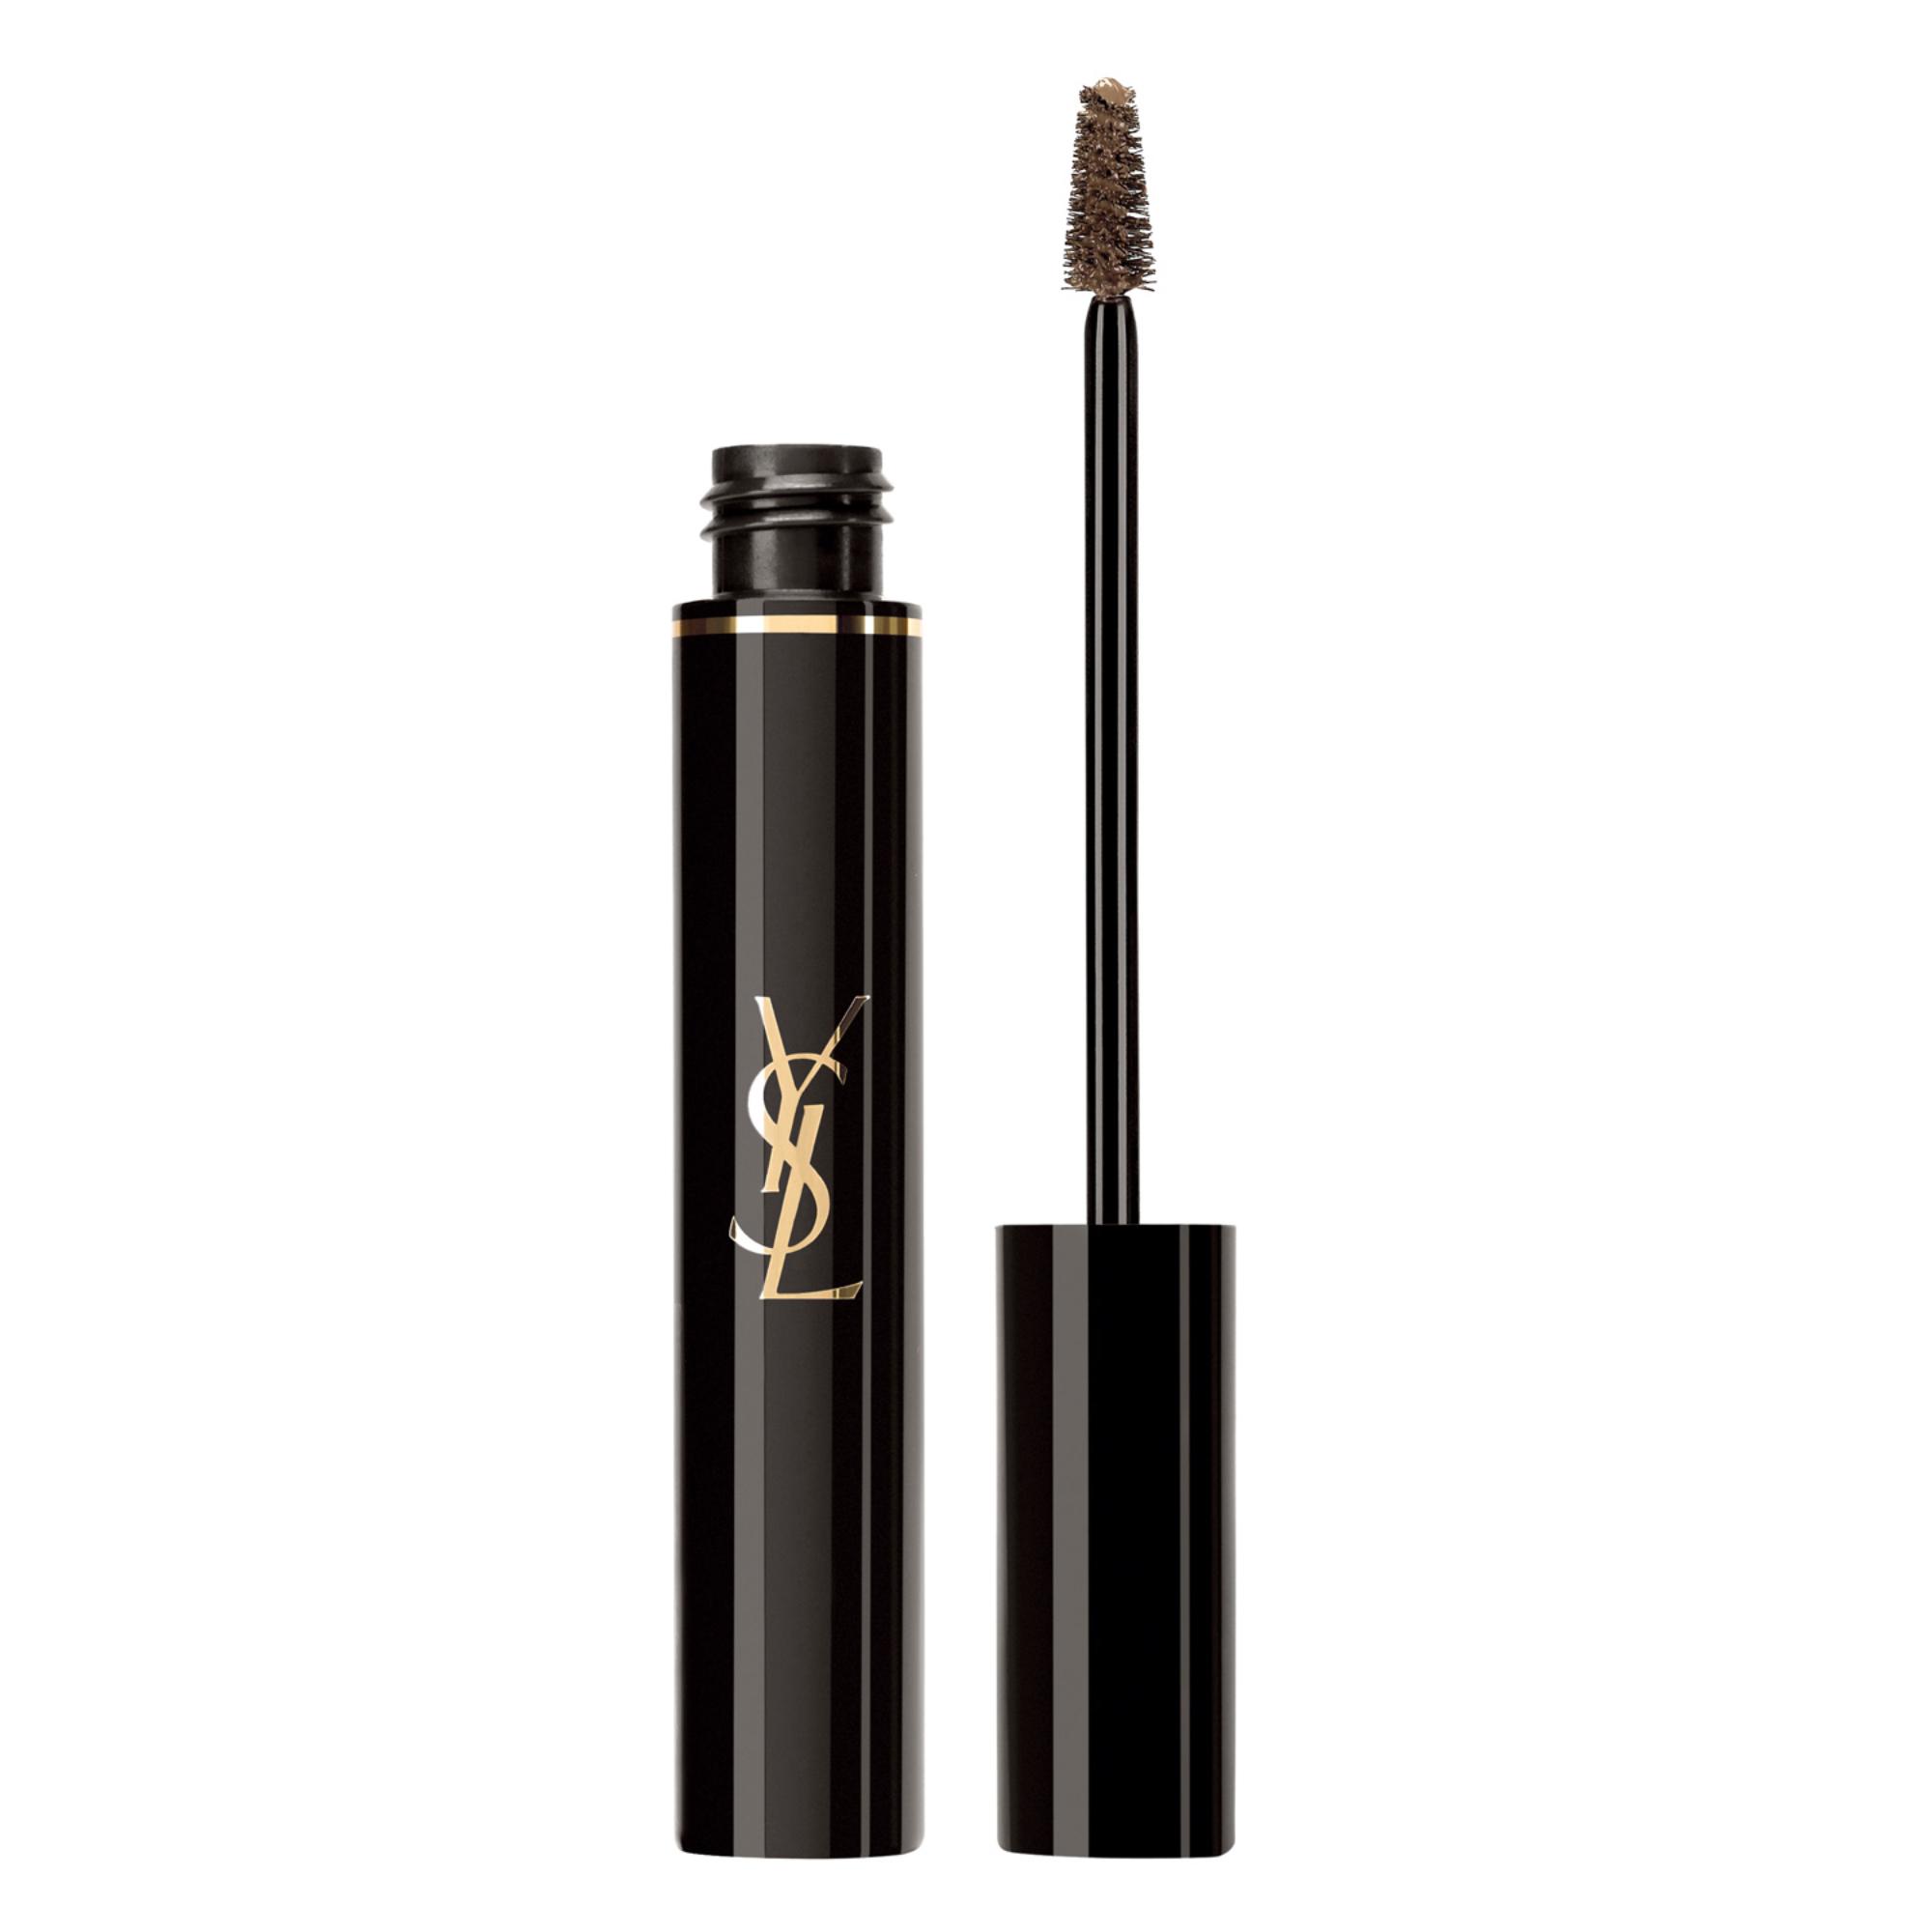 Yves Saint Laurent Couture Brow Mascara, 02 hazel grey